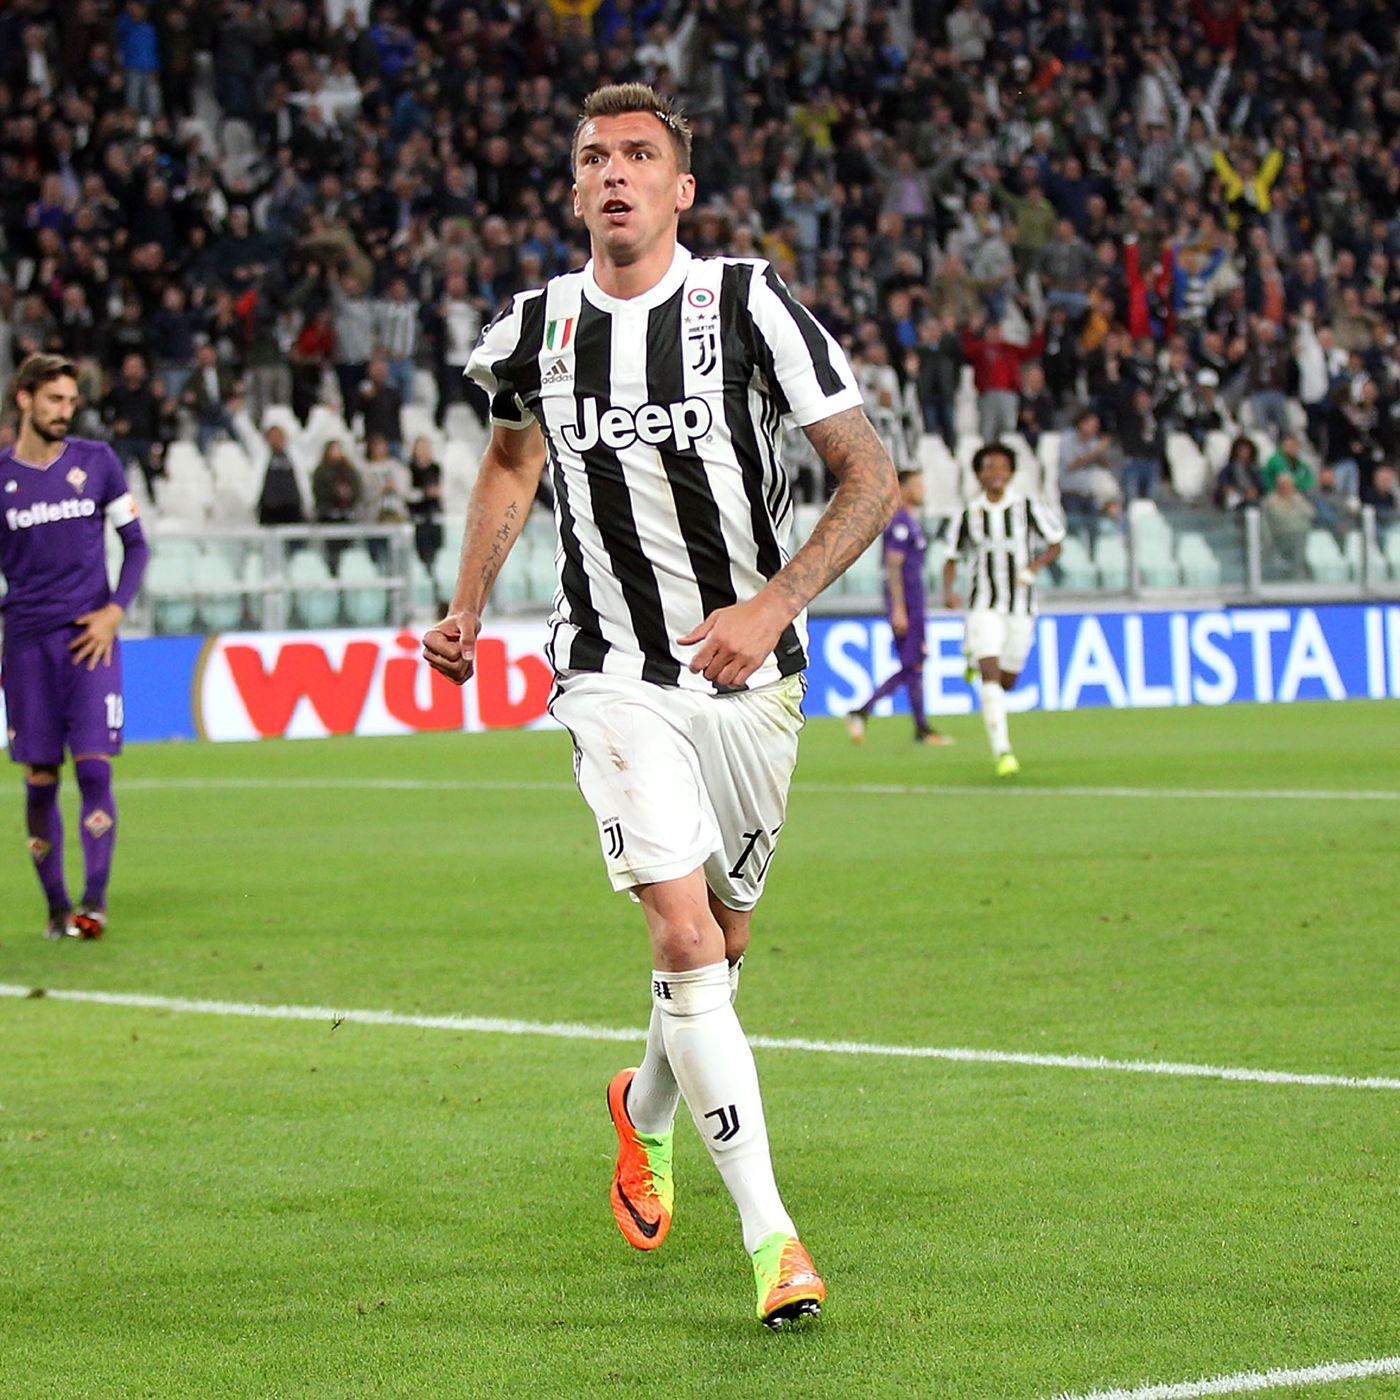 b223b44132f Juventus vs. Fiorentina  Mandzukic heads Juve to victory over Viola ...